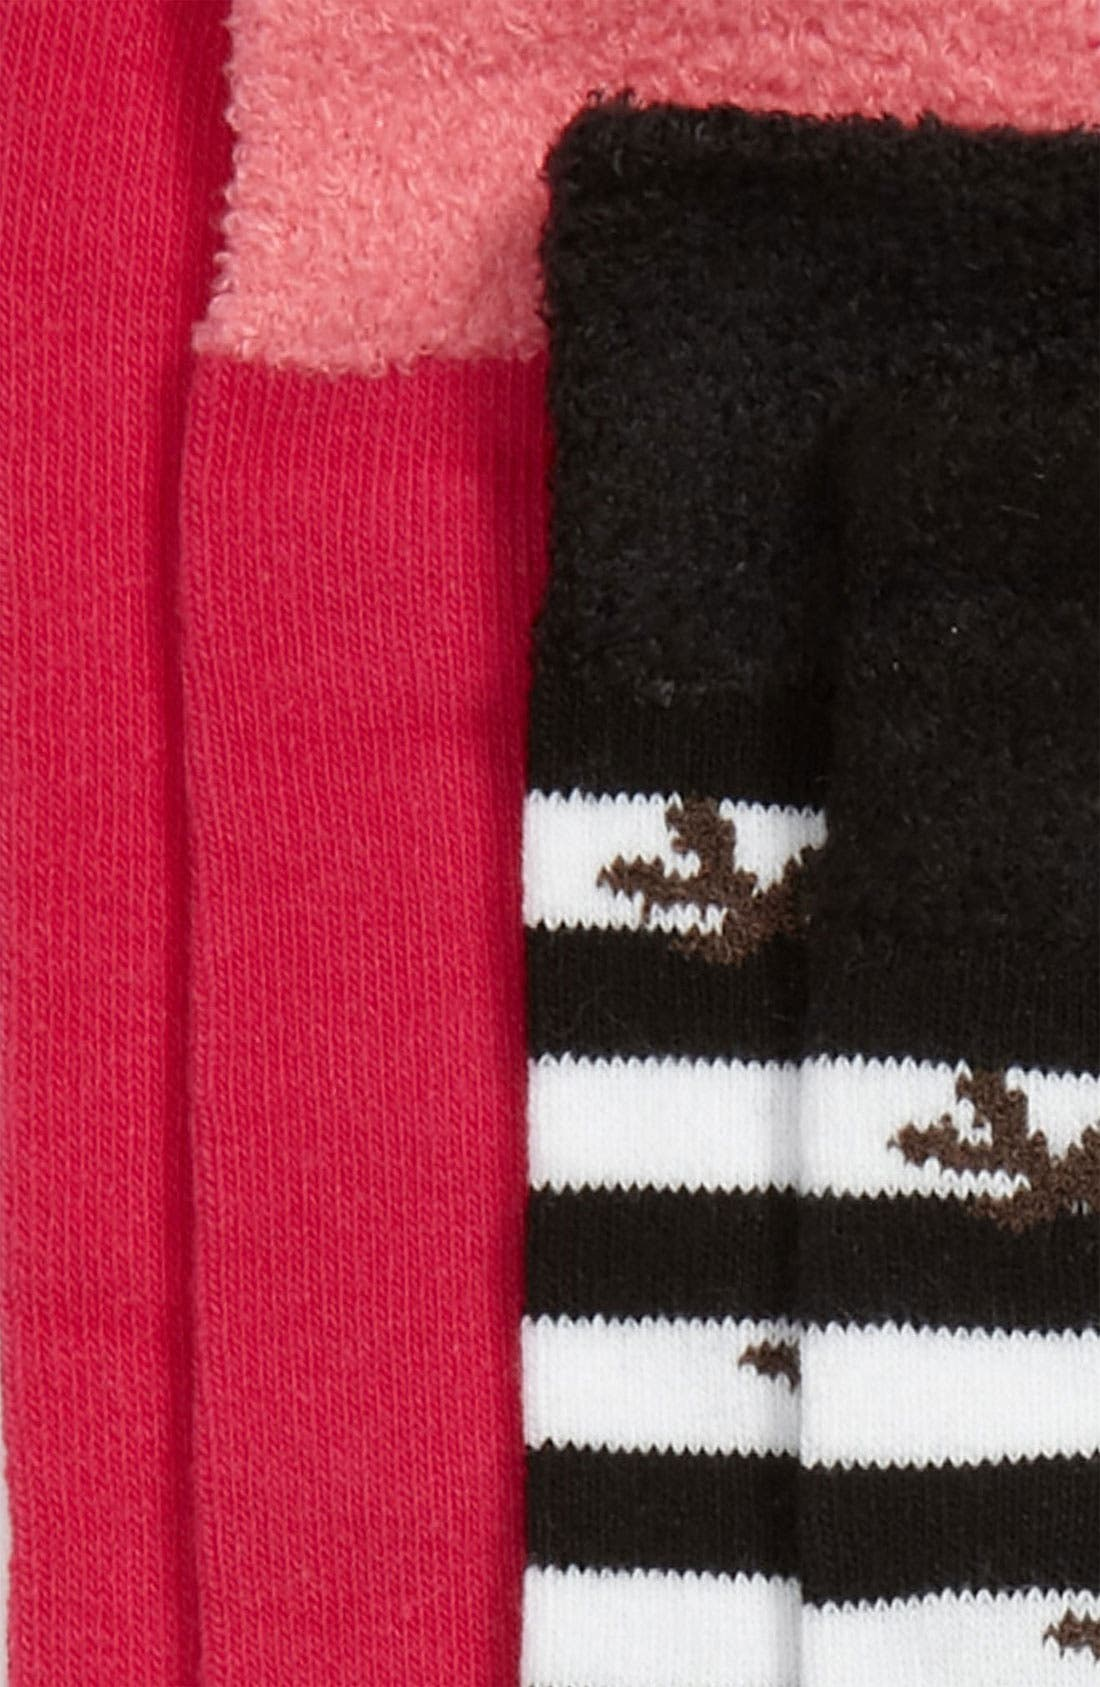 Alternate Image 2  - Nordstrom 'Silly Reindeer' Knee High Socks (2-Pack) (Walker, Toddler, Little Kid & Big Kid)